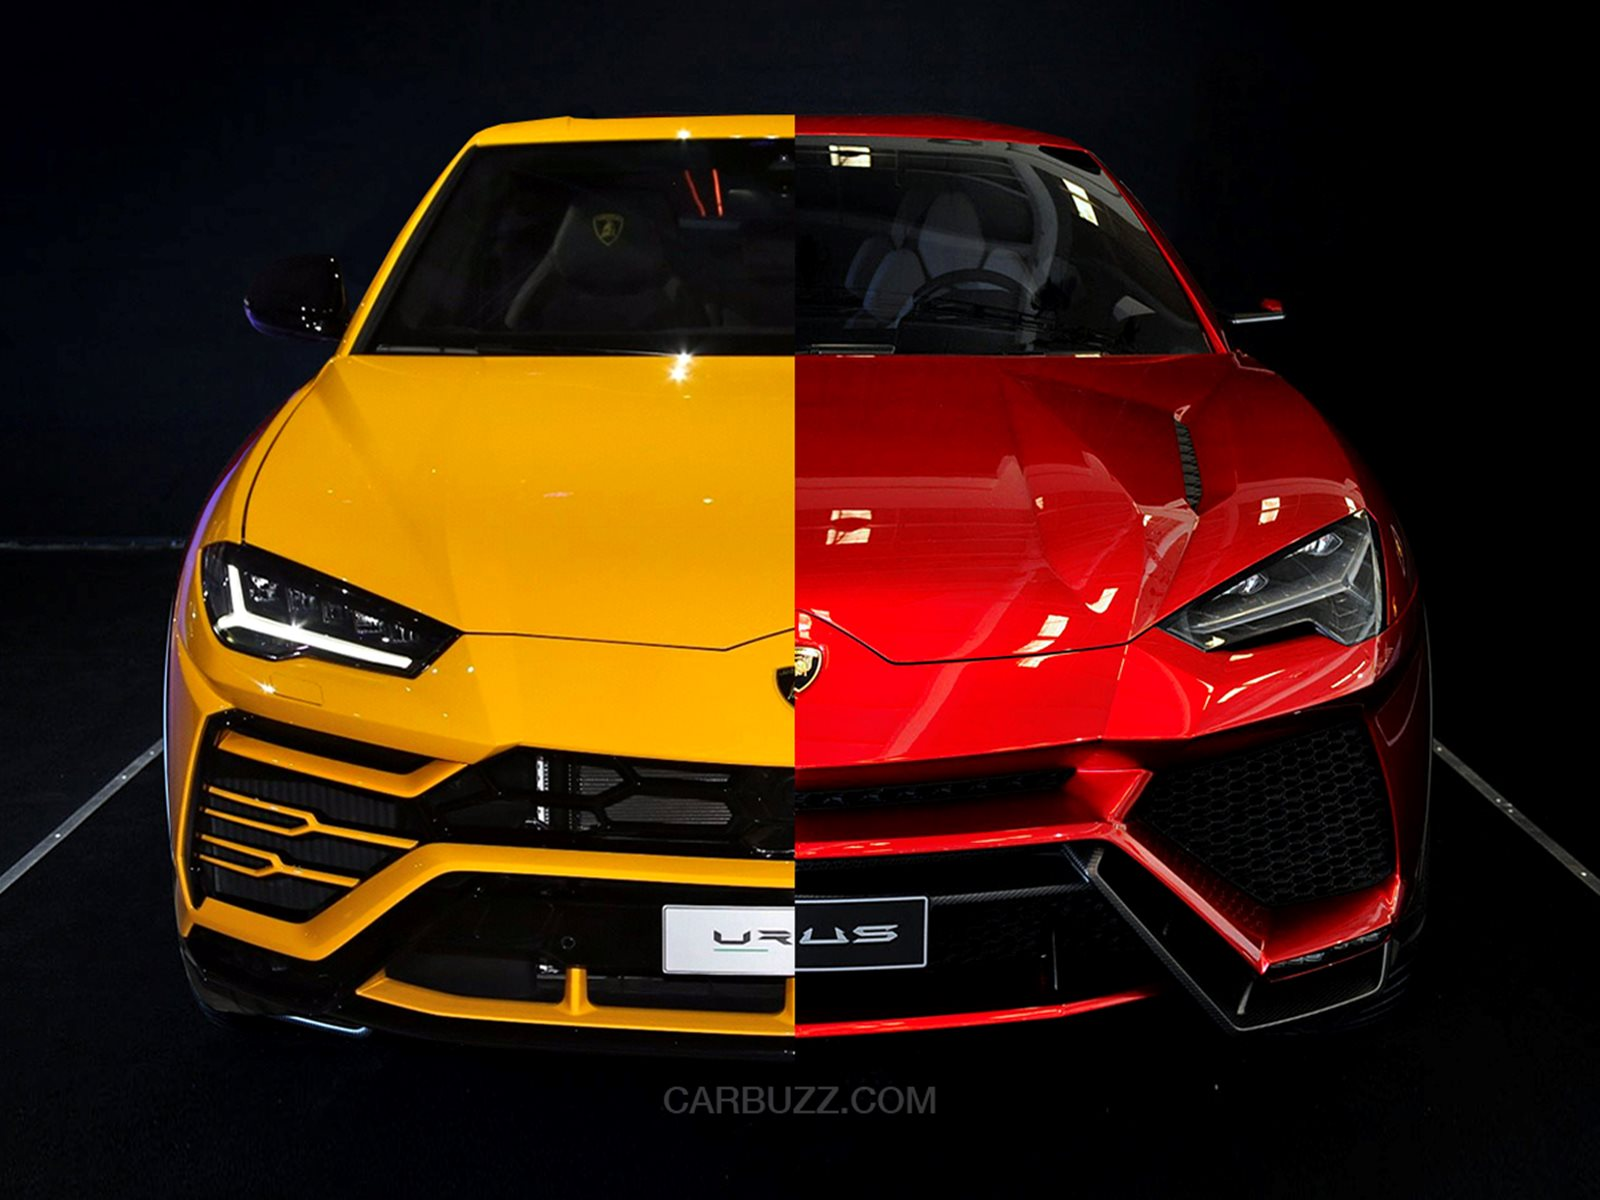 Lamborghini Urus Design Changes 2012 Concept Vs 2017 Final Version